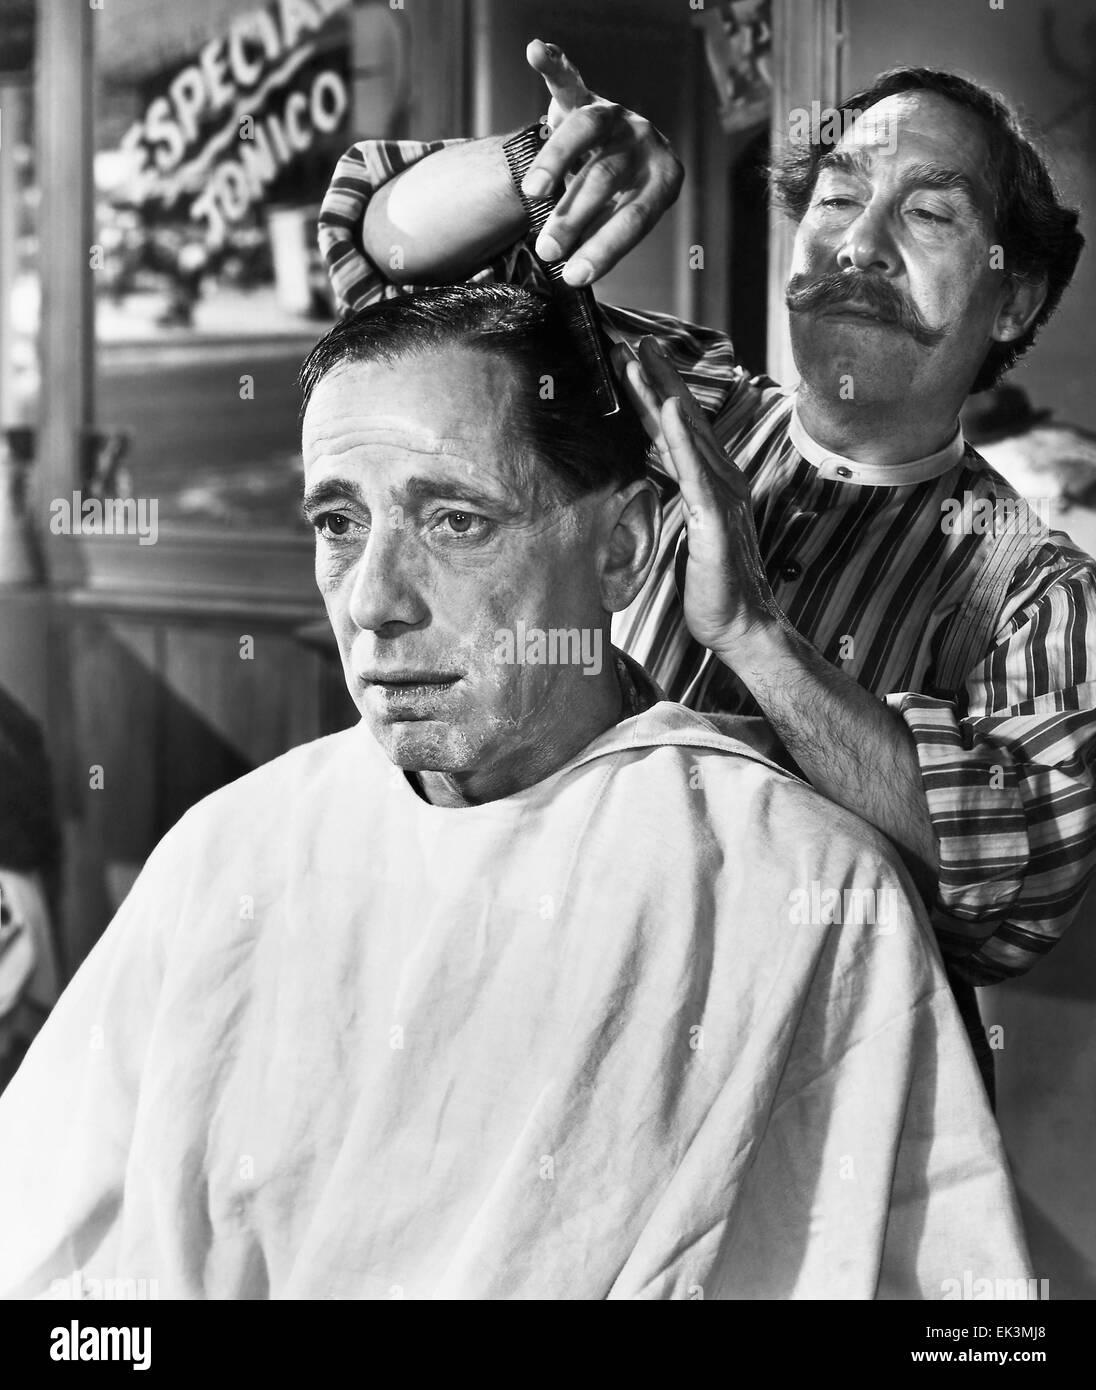 Humphrey Bogart, Julian Rivero, on-set of the Film 'The Treasure of the Sierra Madre', 1948 - Stock Image